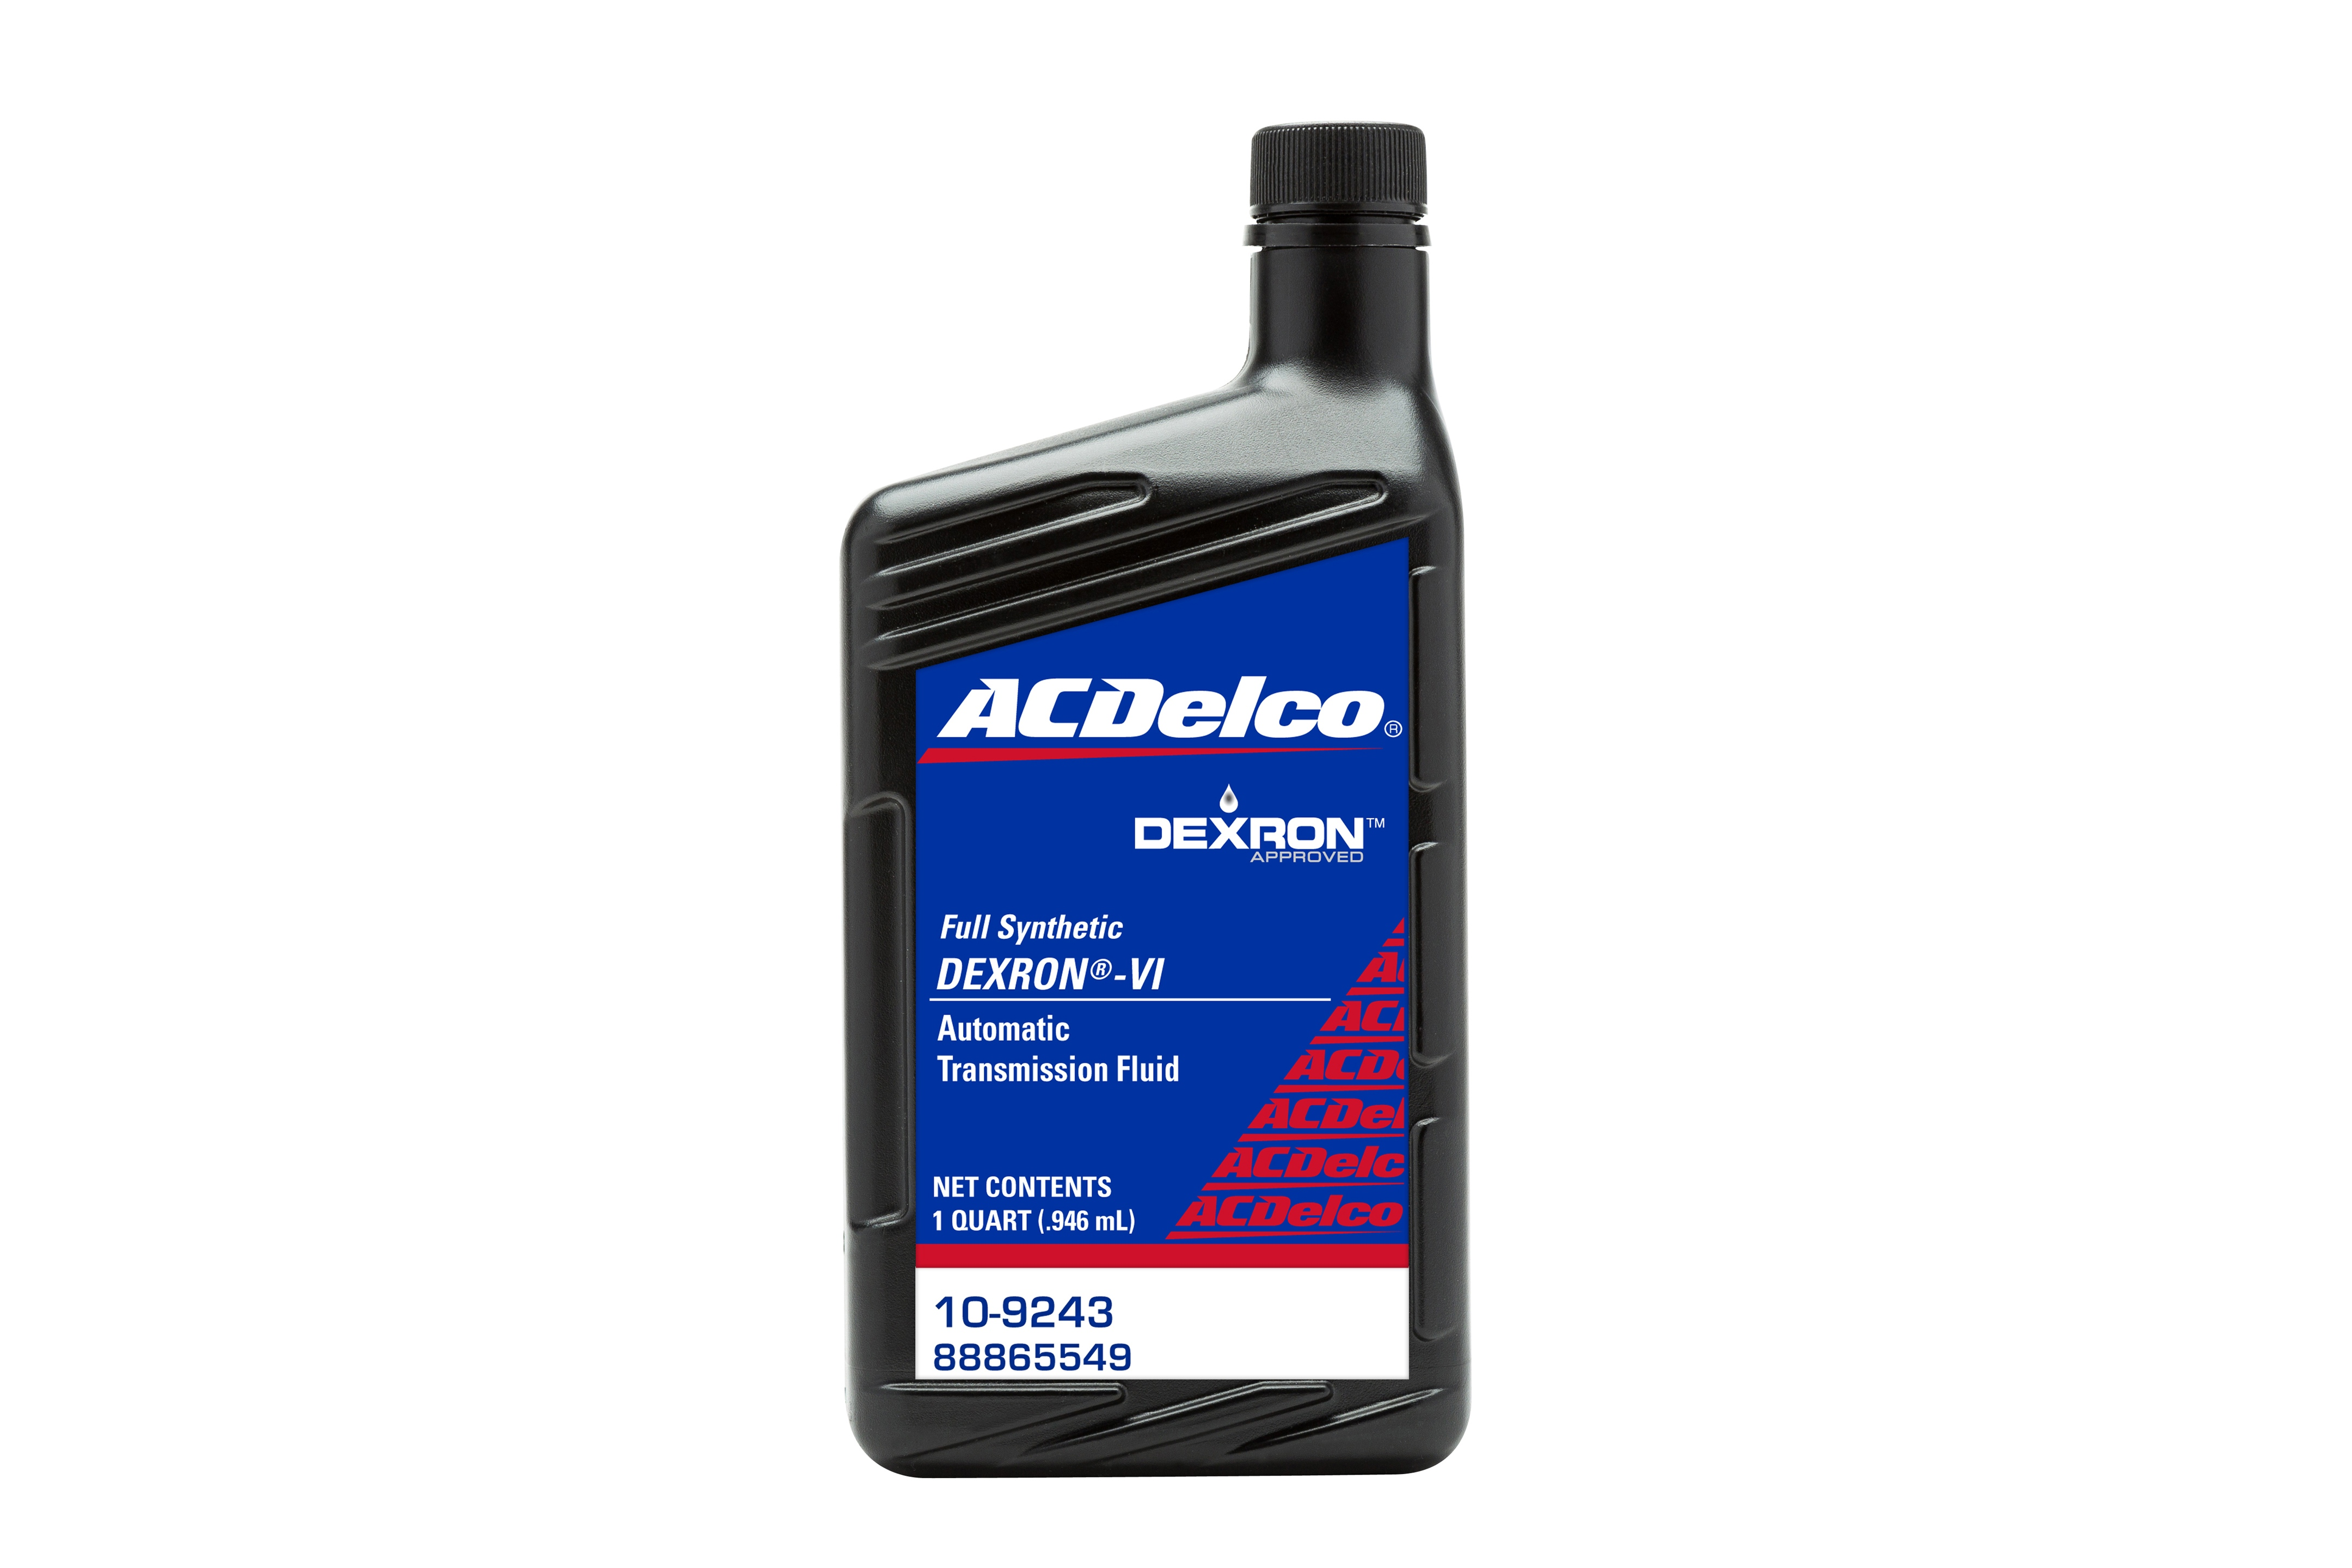 ACDELCO PROFESSIONAL - Auto Trans Fluid - 1 Quart - DCC 10-9243